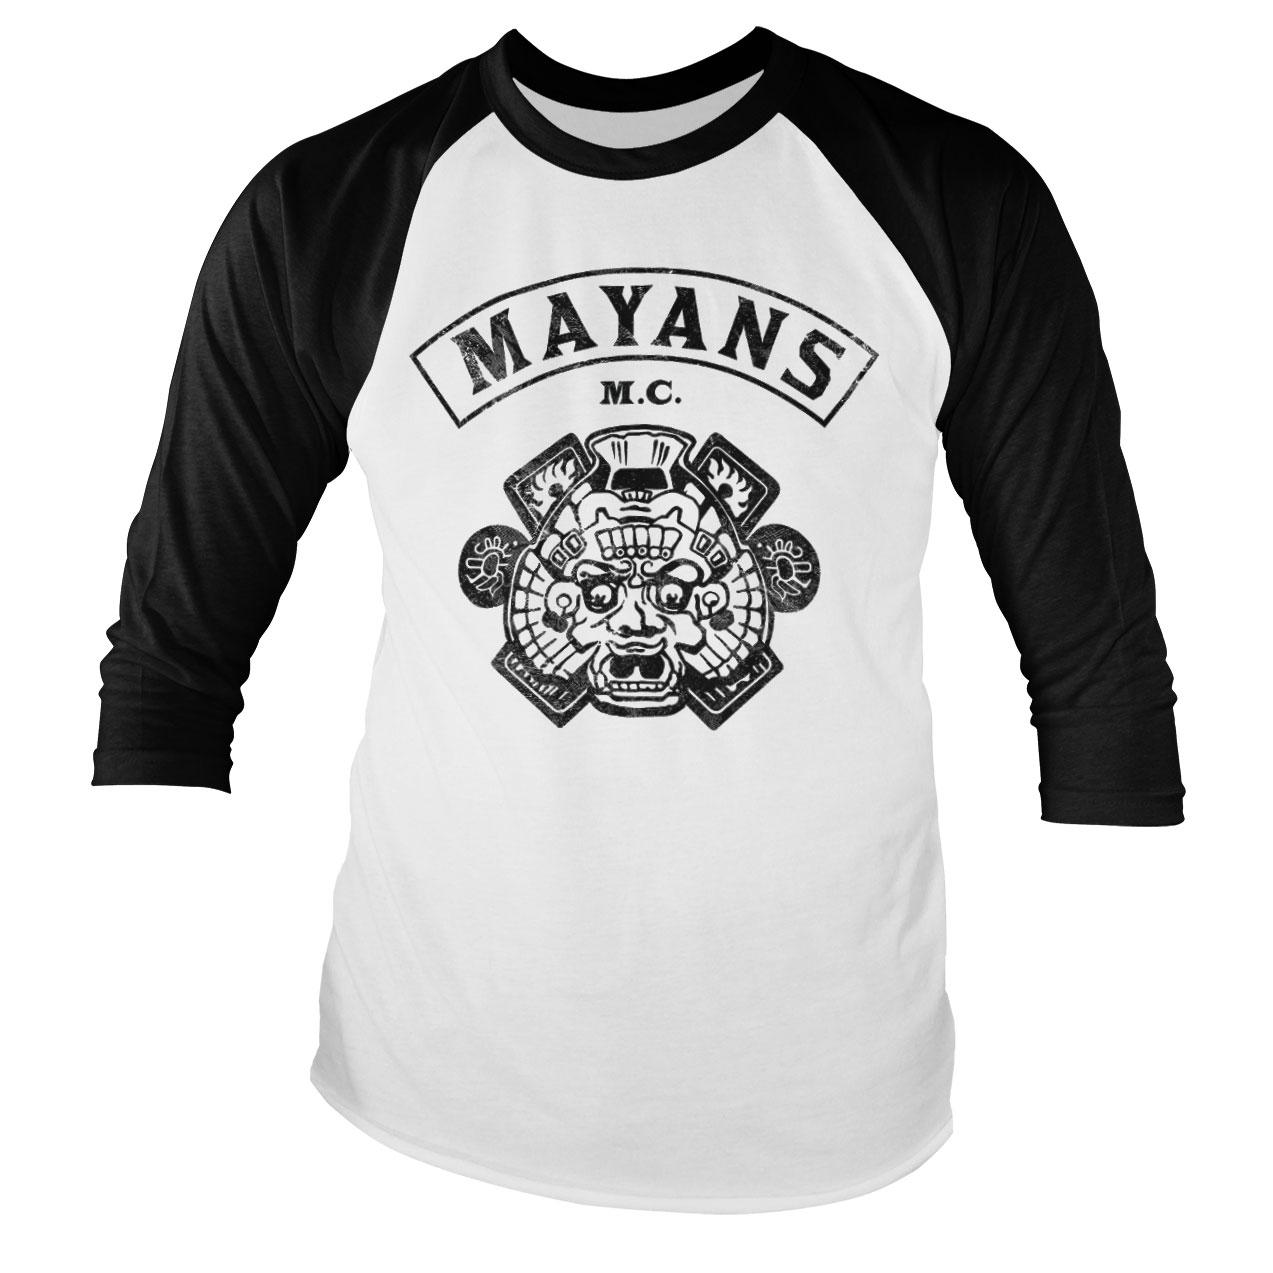 Tričká s trojštvrťovým rukávom Mayans M.C.